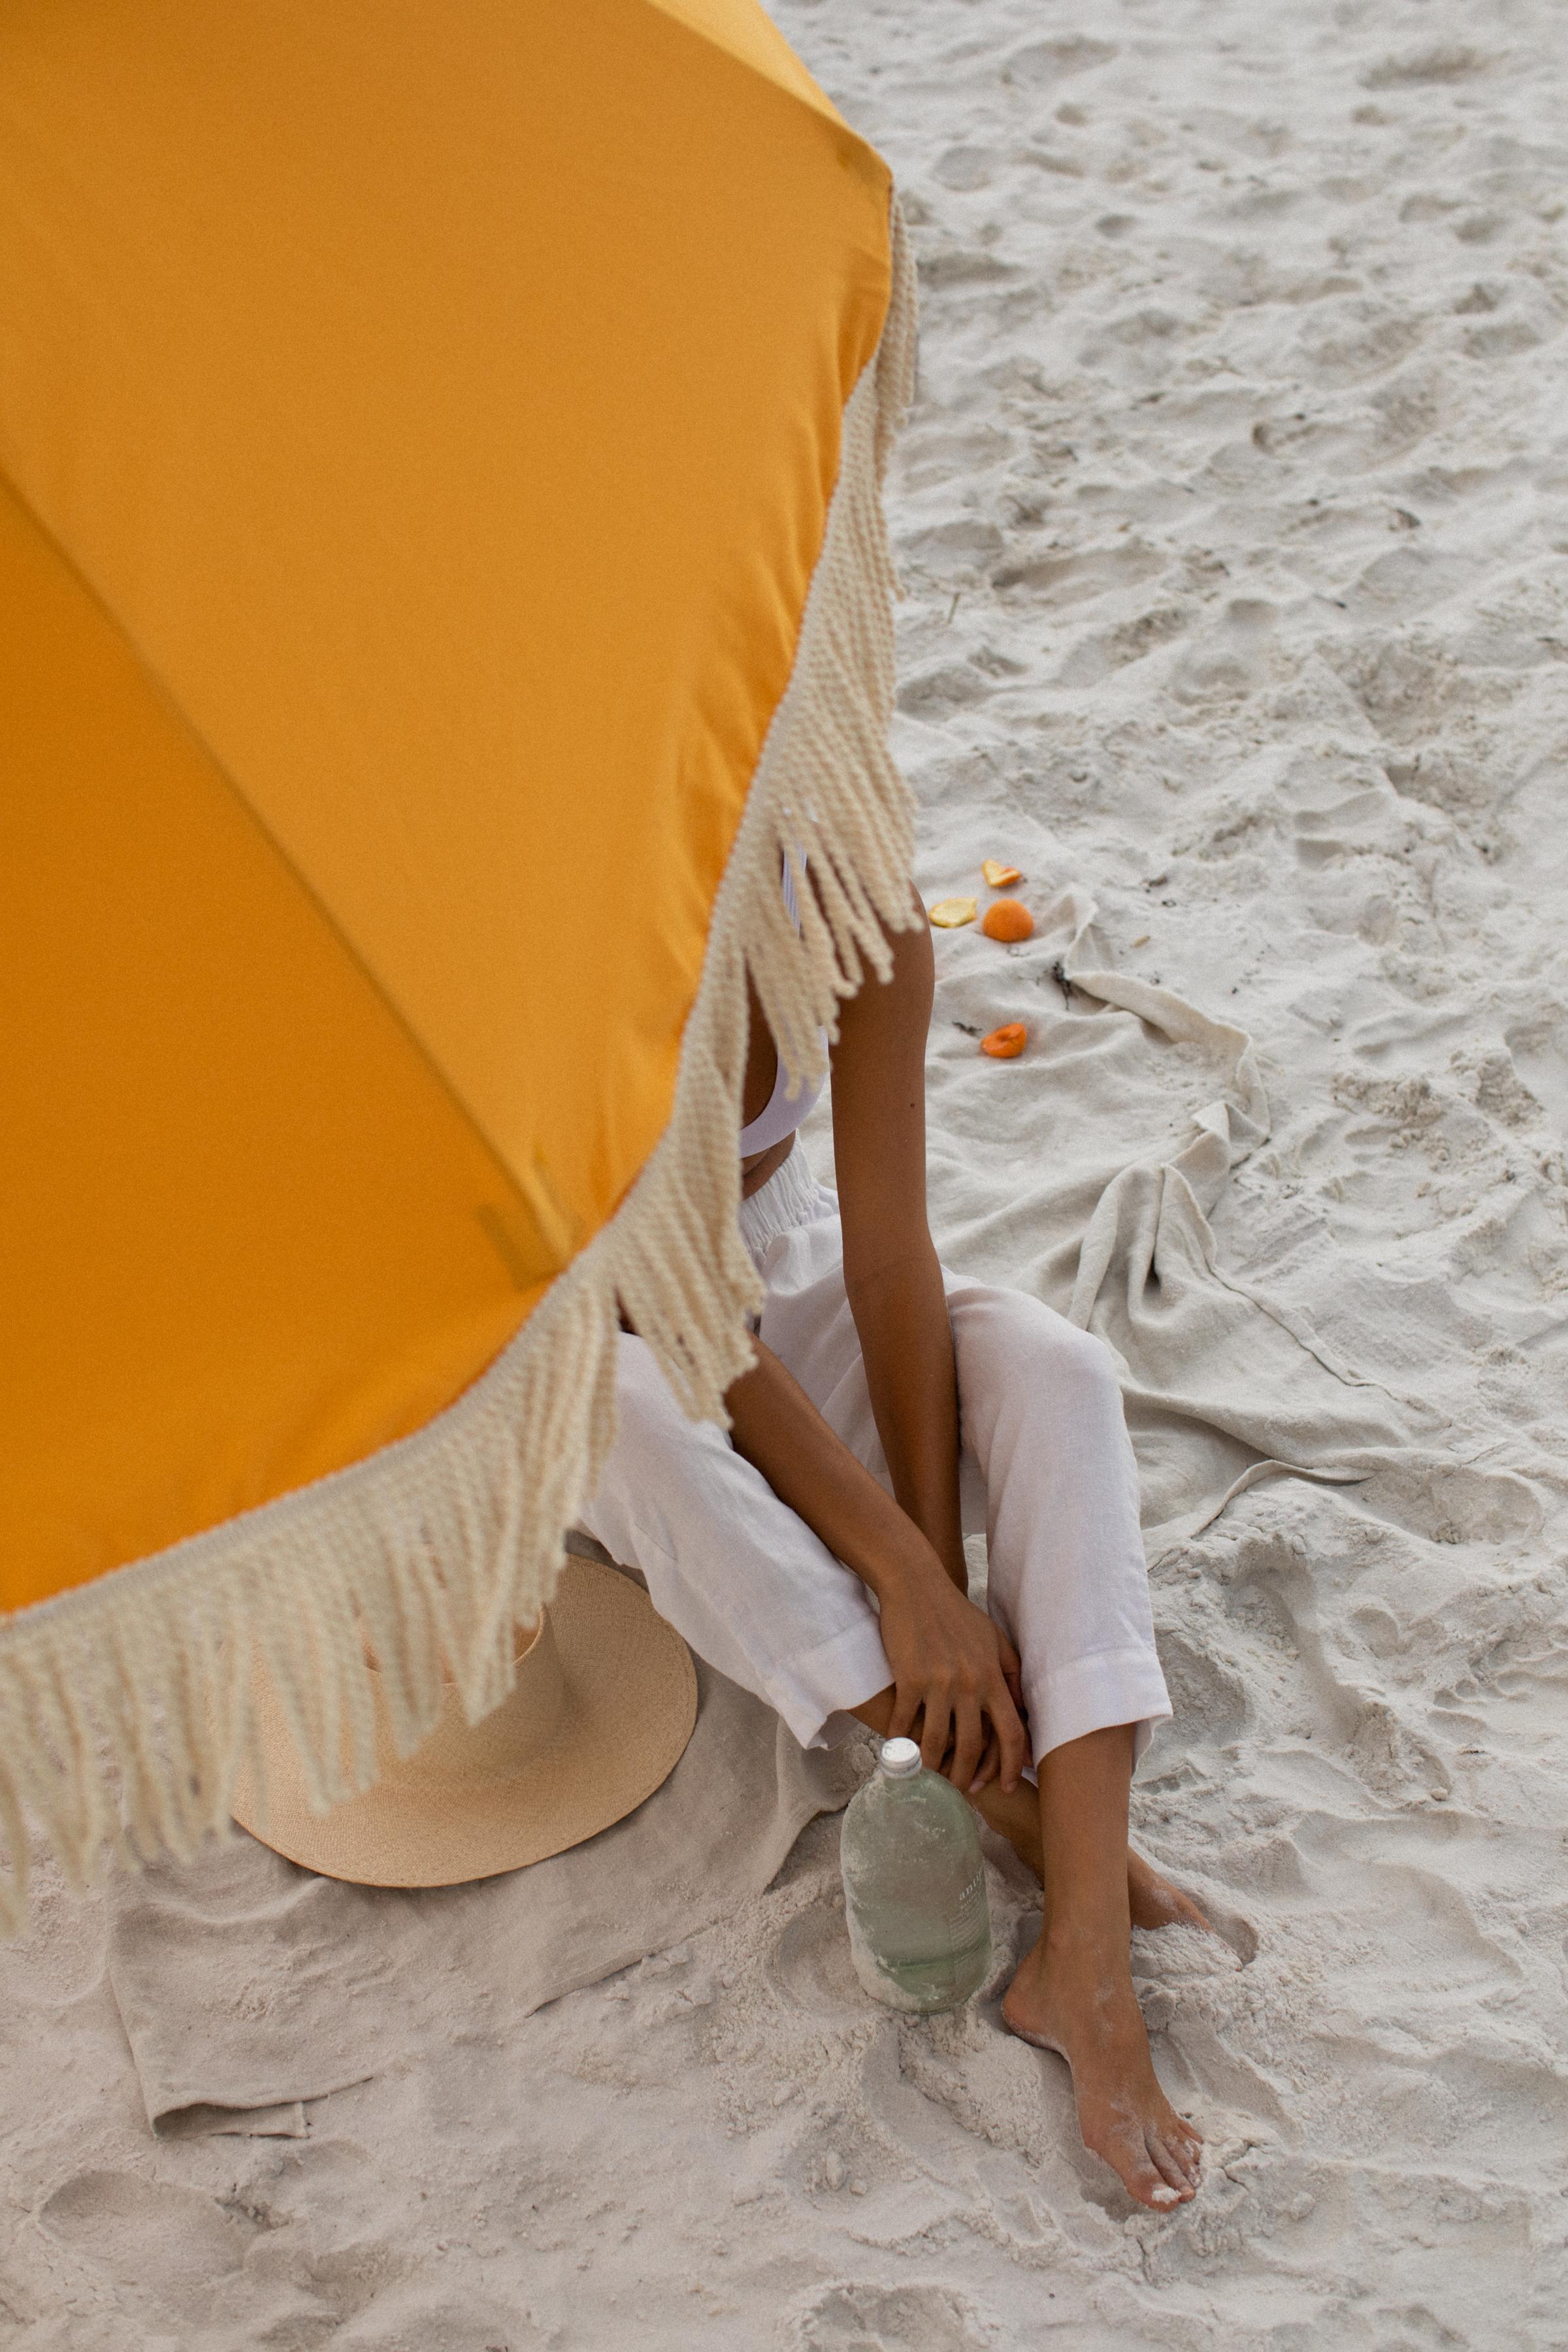 britney-gill-photography_KAIYA-BEACH-RESORT_154.jpg